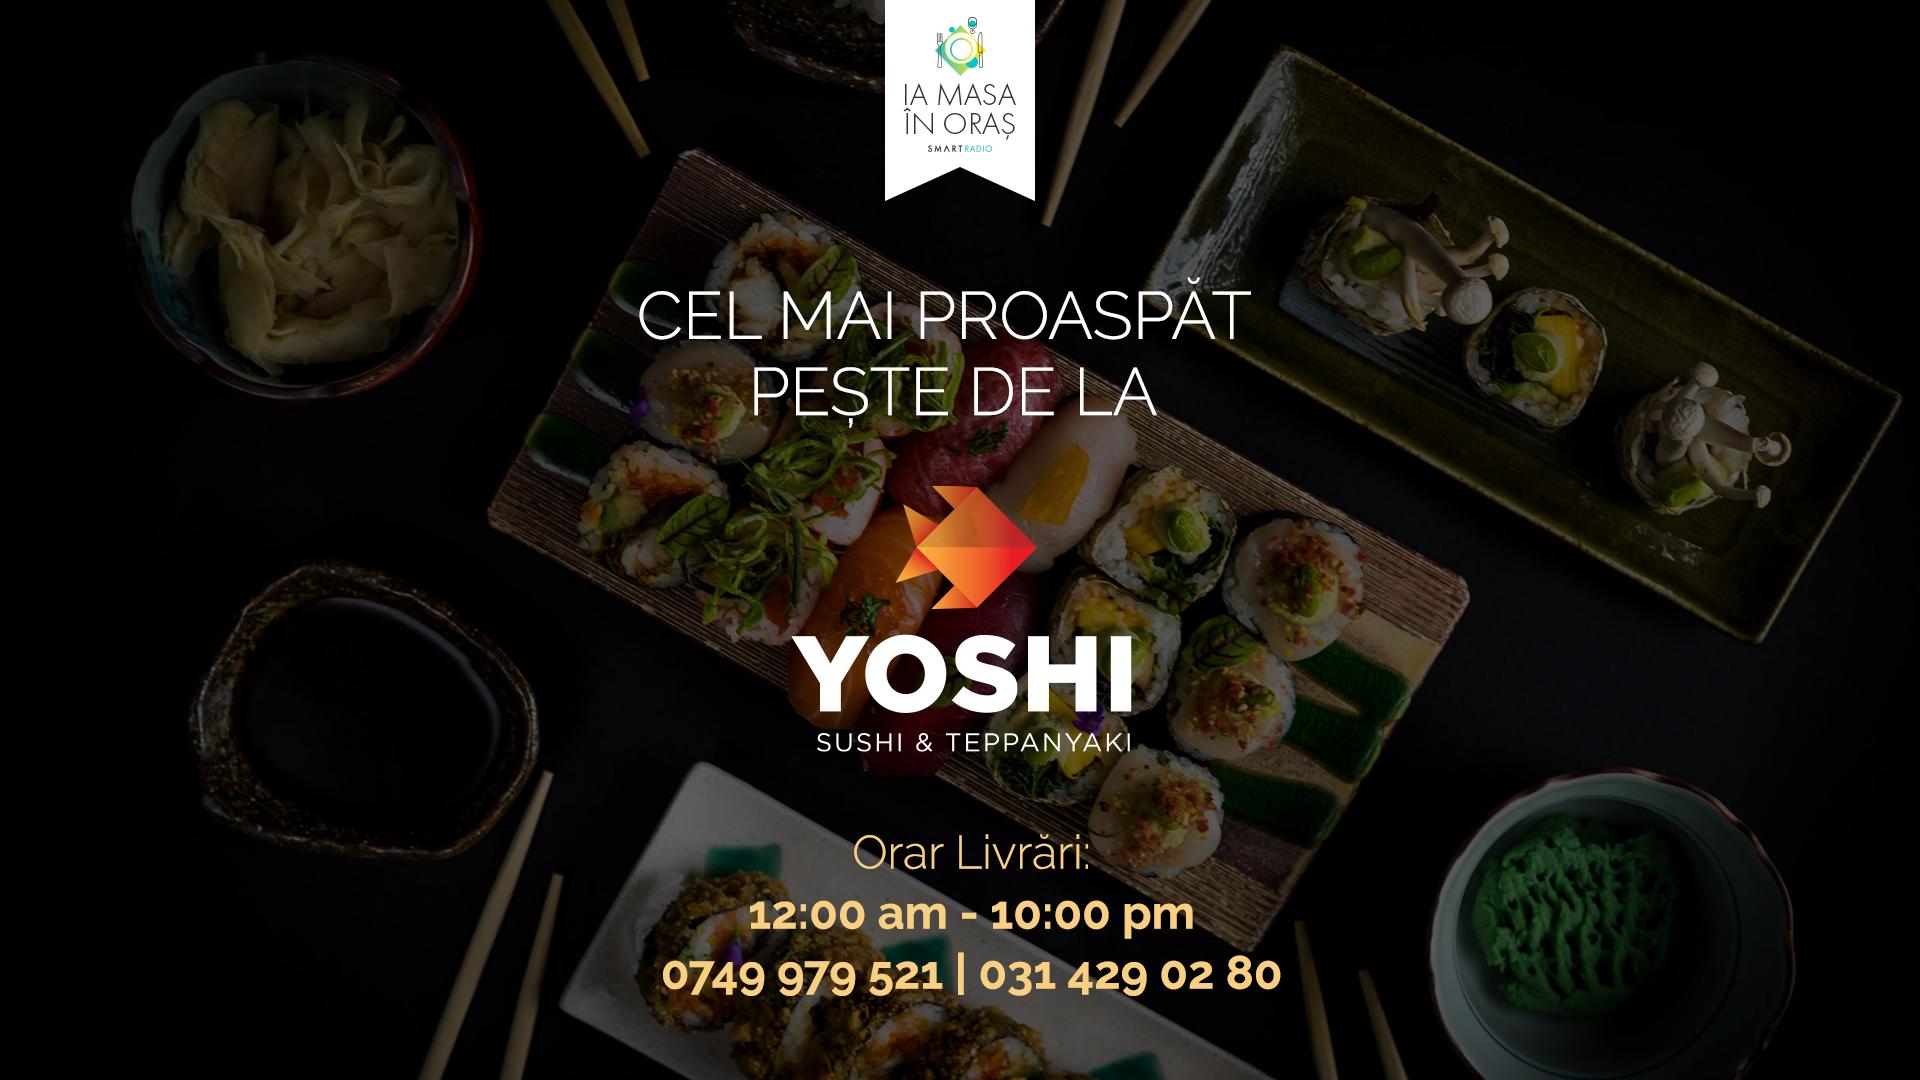 IA MASA ÎN ORAȘ – cina la Yoshi